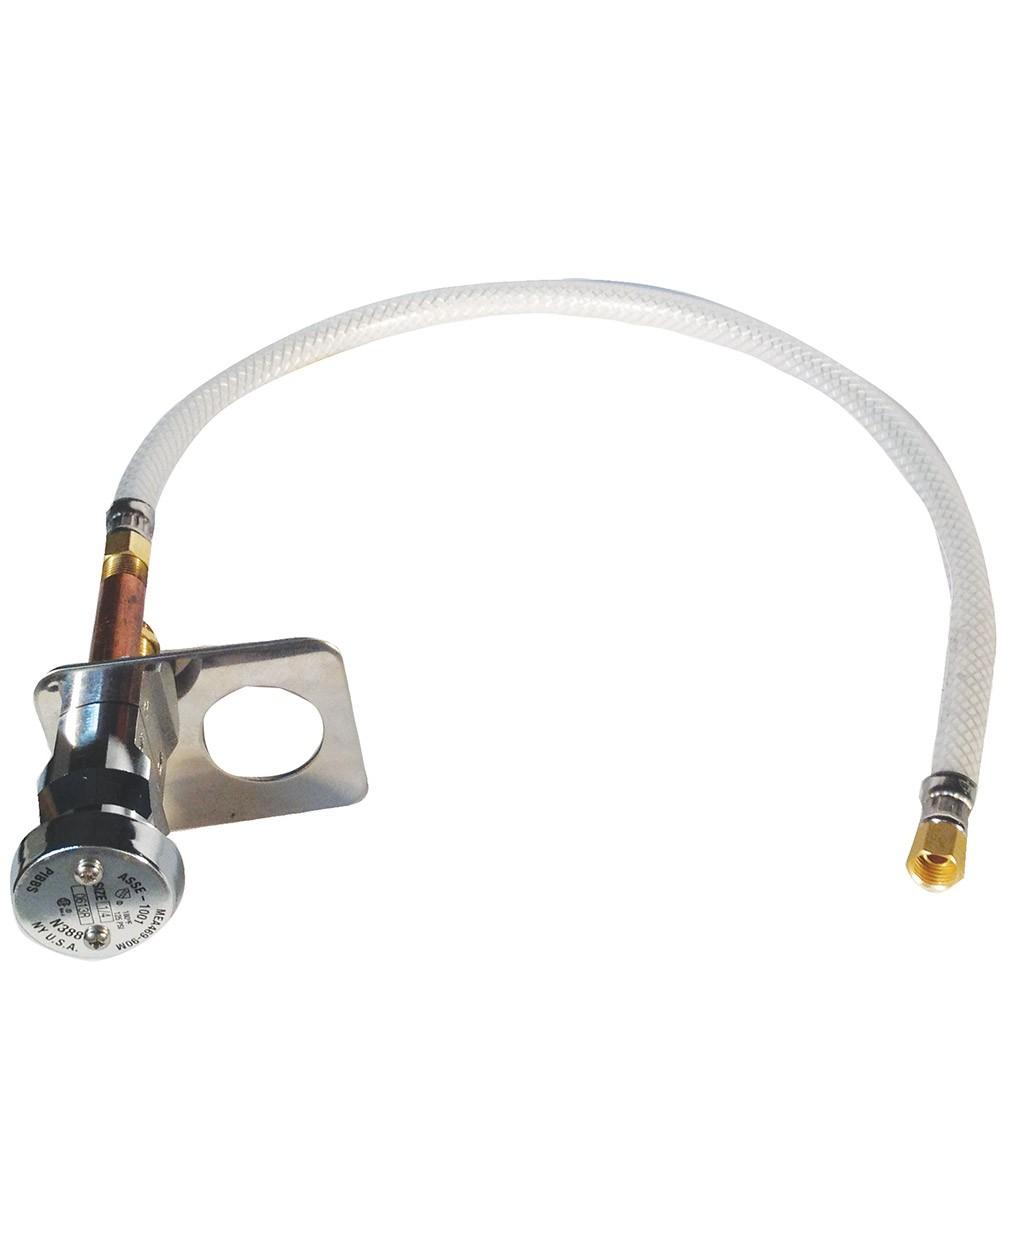 Pibbs P389C Vacuum Breaker Kit for Italian Backwash Bowls